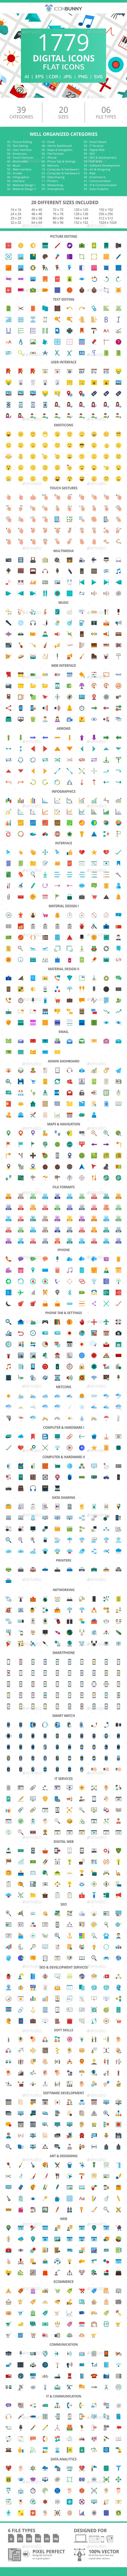 1779 Digital Flat Icons - Icons